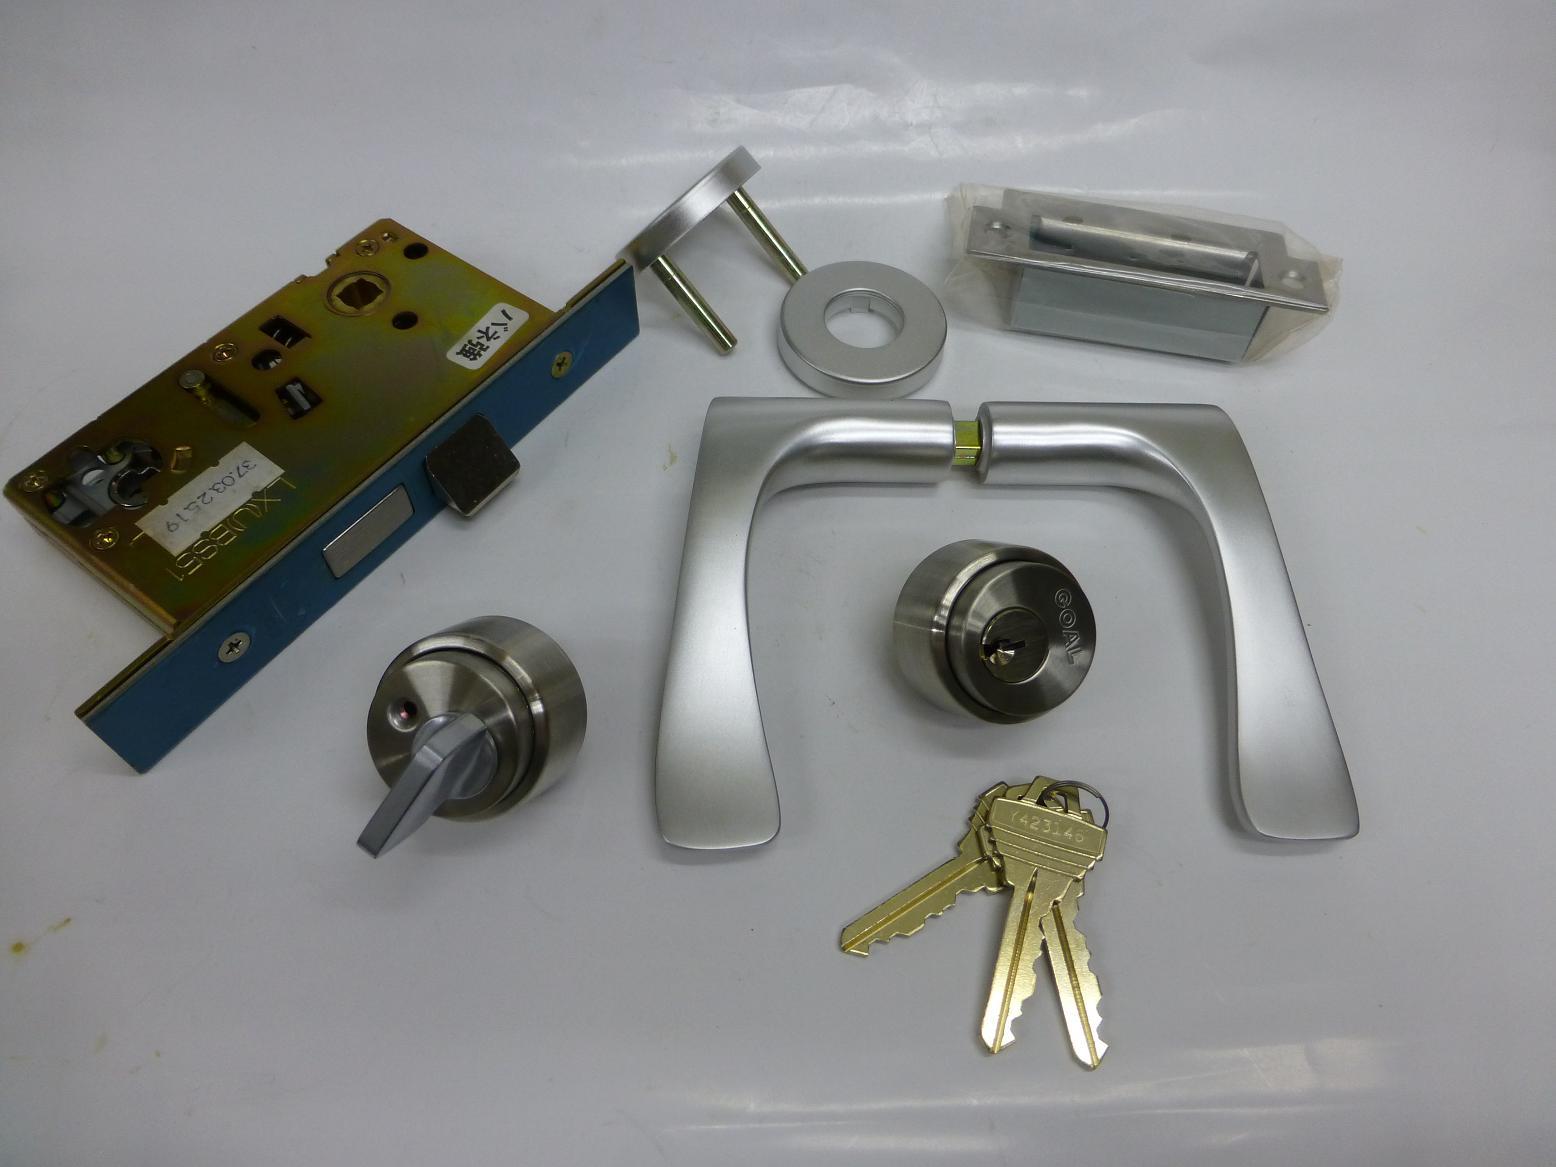 GOAL 本締錠 LX5A 40A 33~43mm  51mm